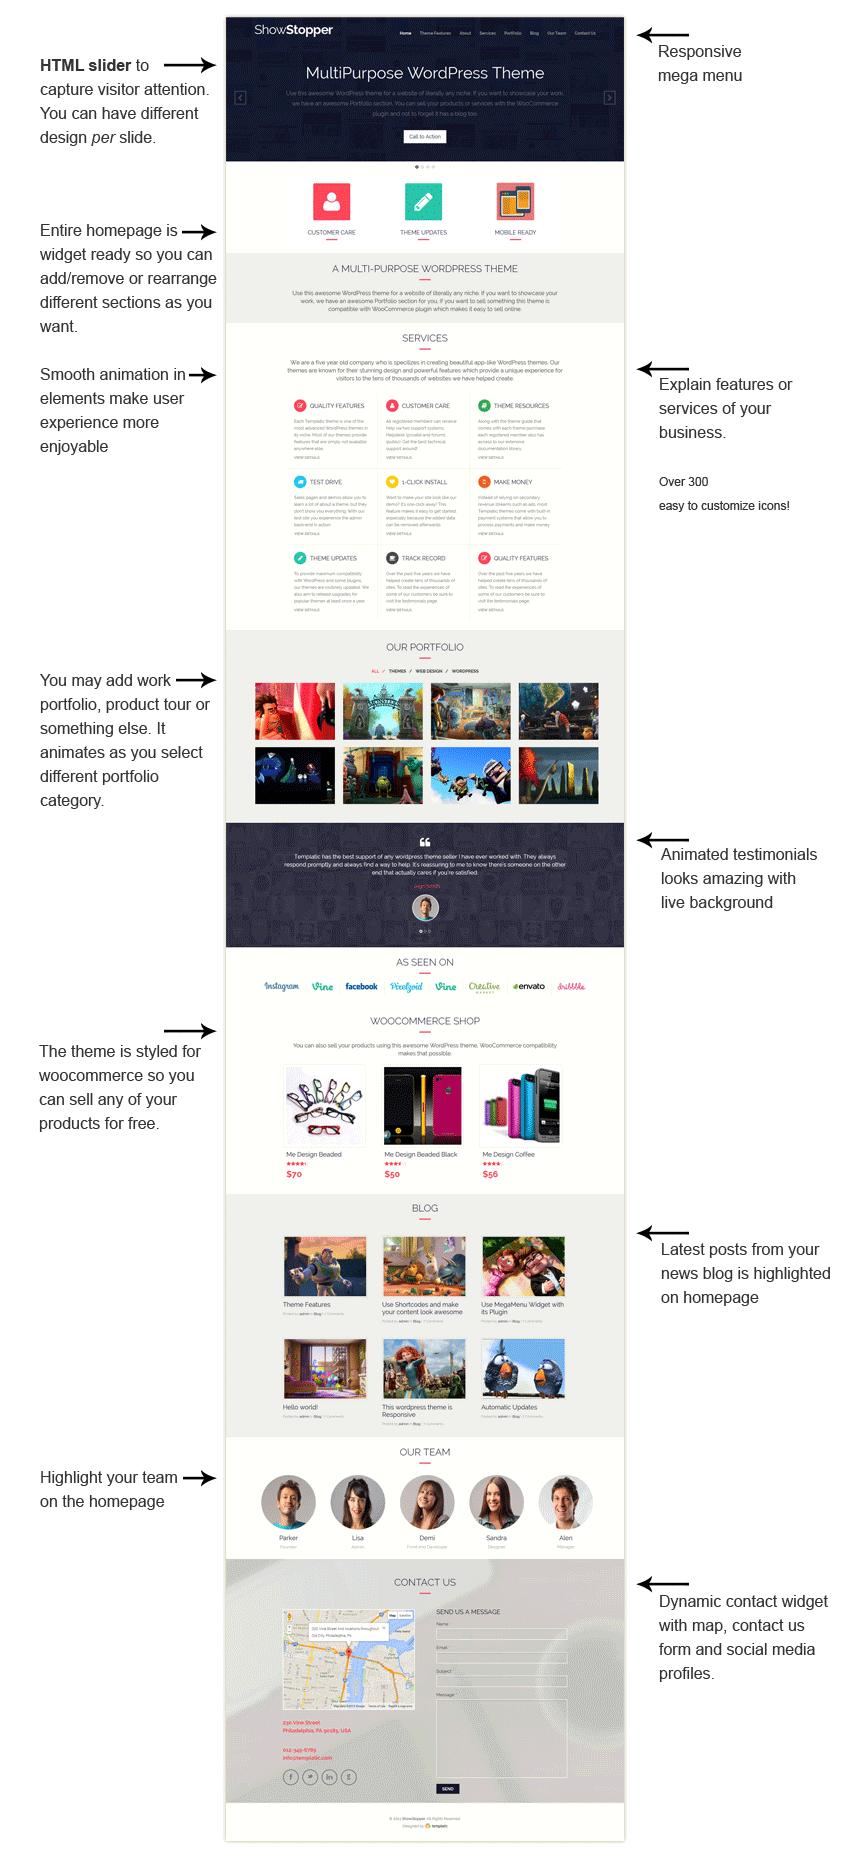 ShowStopper - a multipurpose WordPress theme